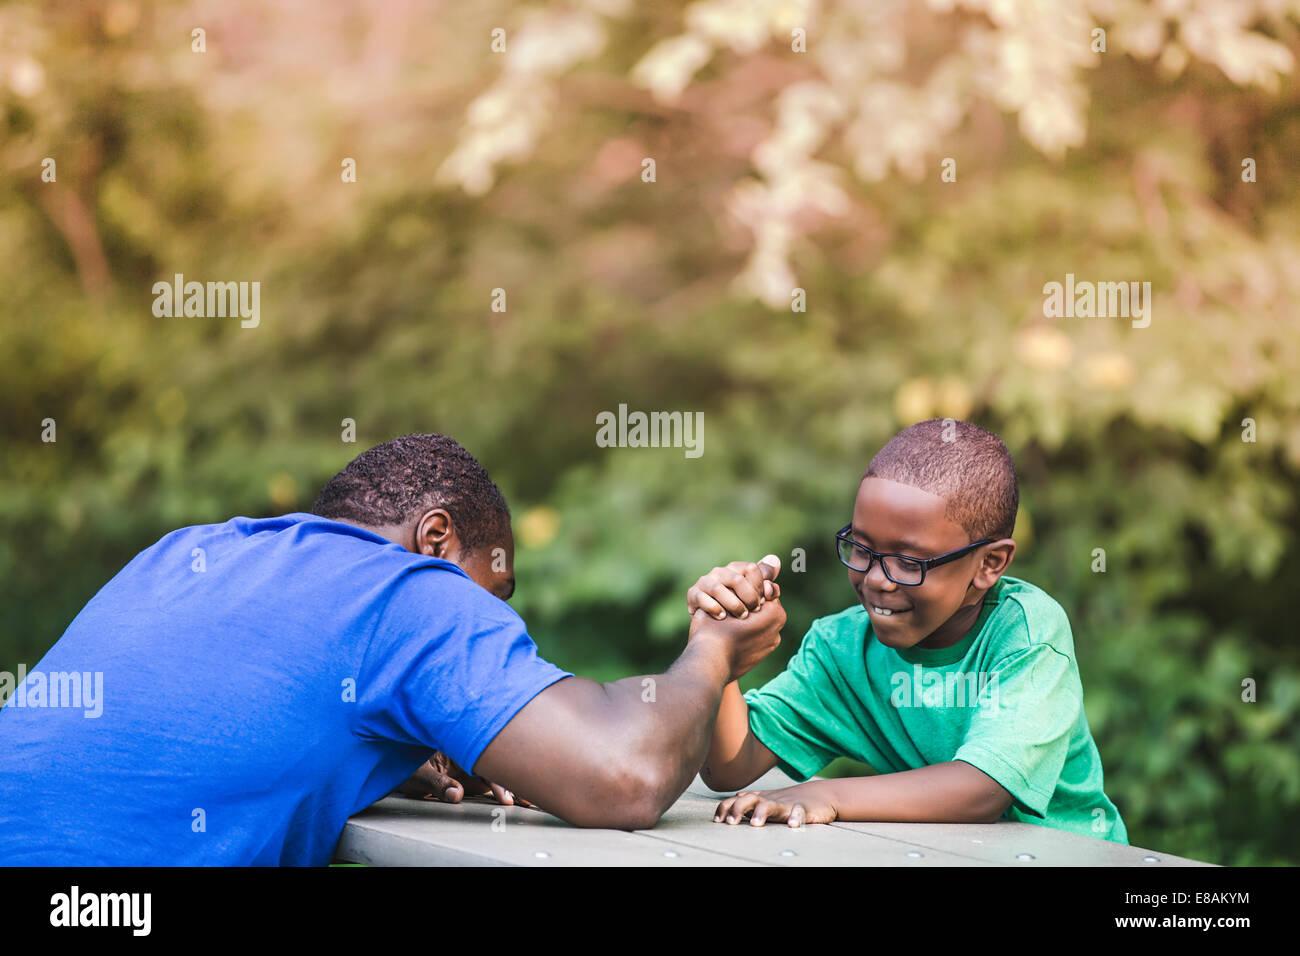 Armdrücken Vater mit Sohn im Parkland Eco camp Stockbild